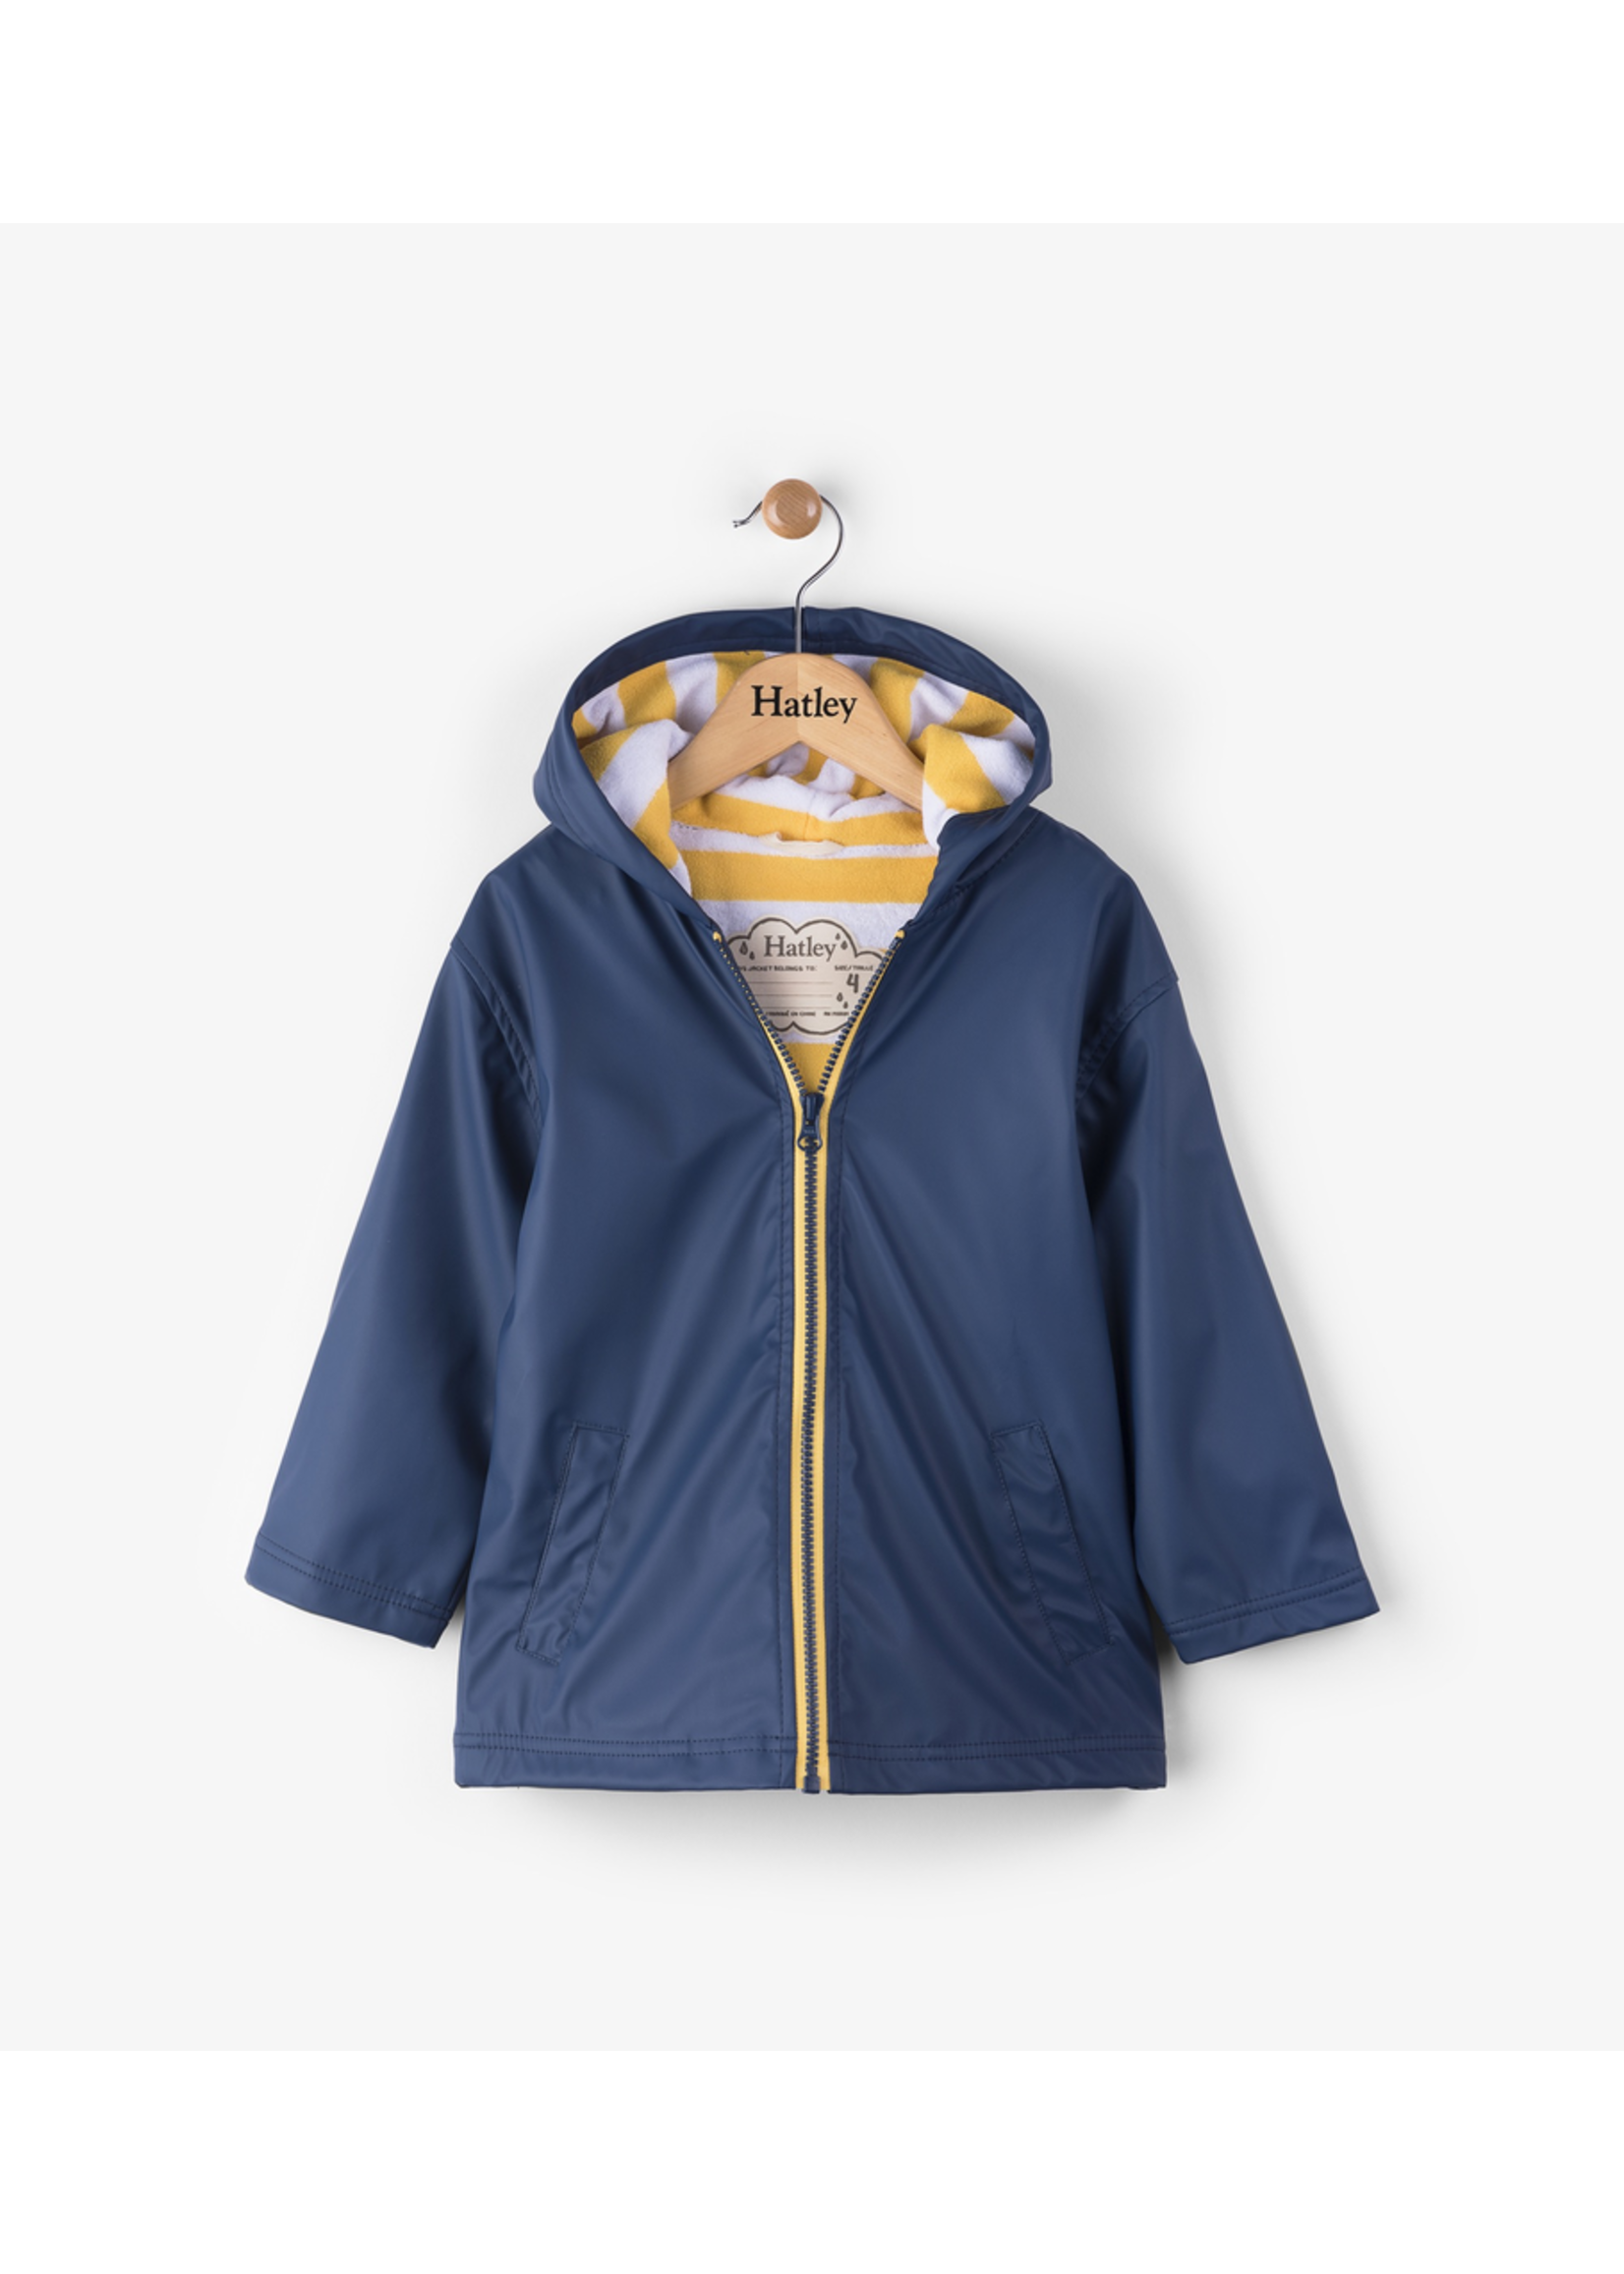 Hatley Hatley, Navy & Yellow Splash Jacket for Boy